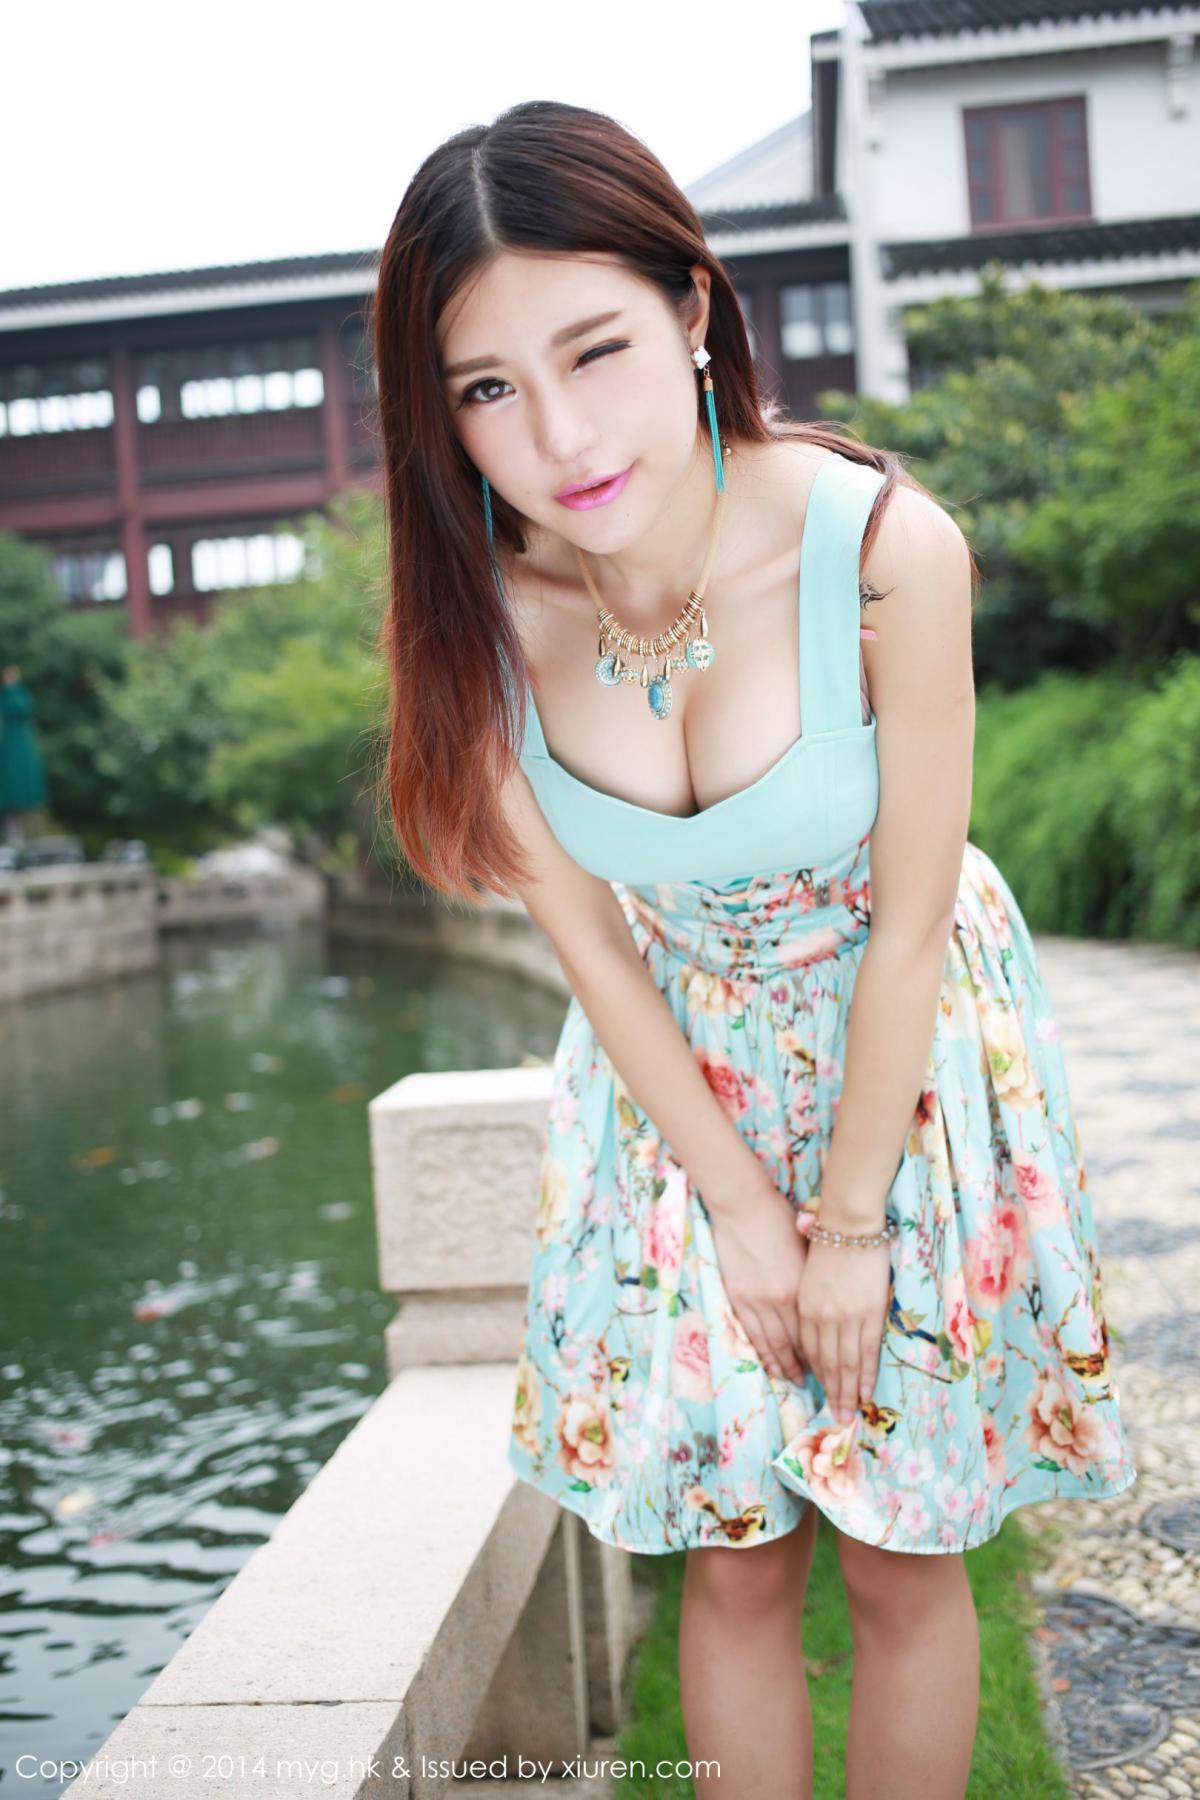 MyGirl Vol. 401 Qi Li Jia - Best Hot Girls